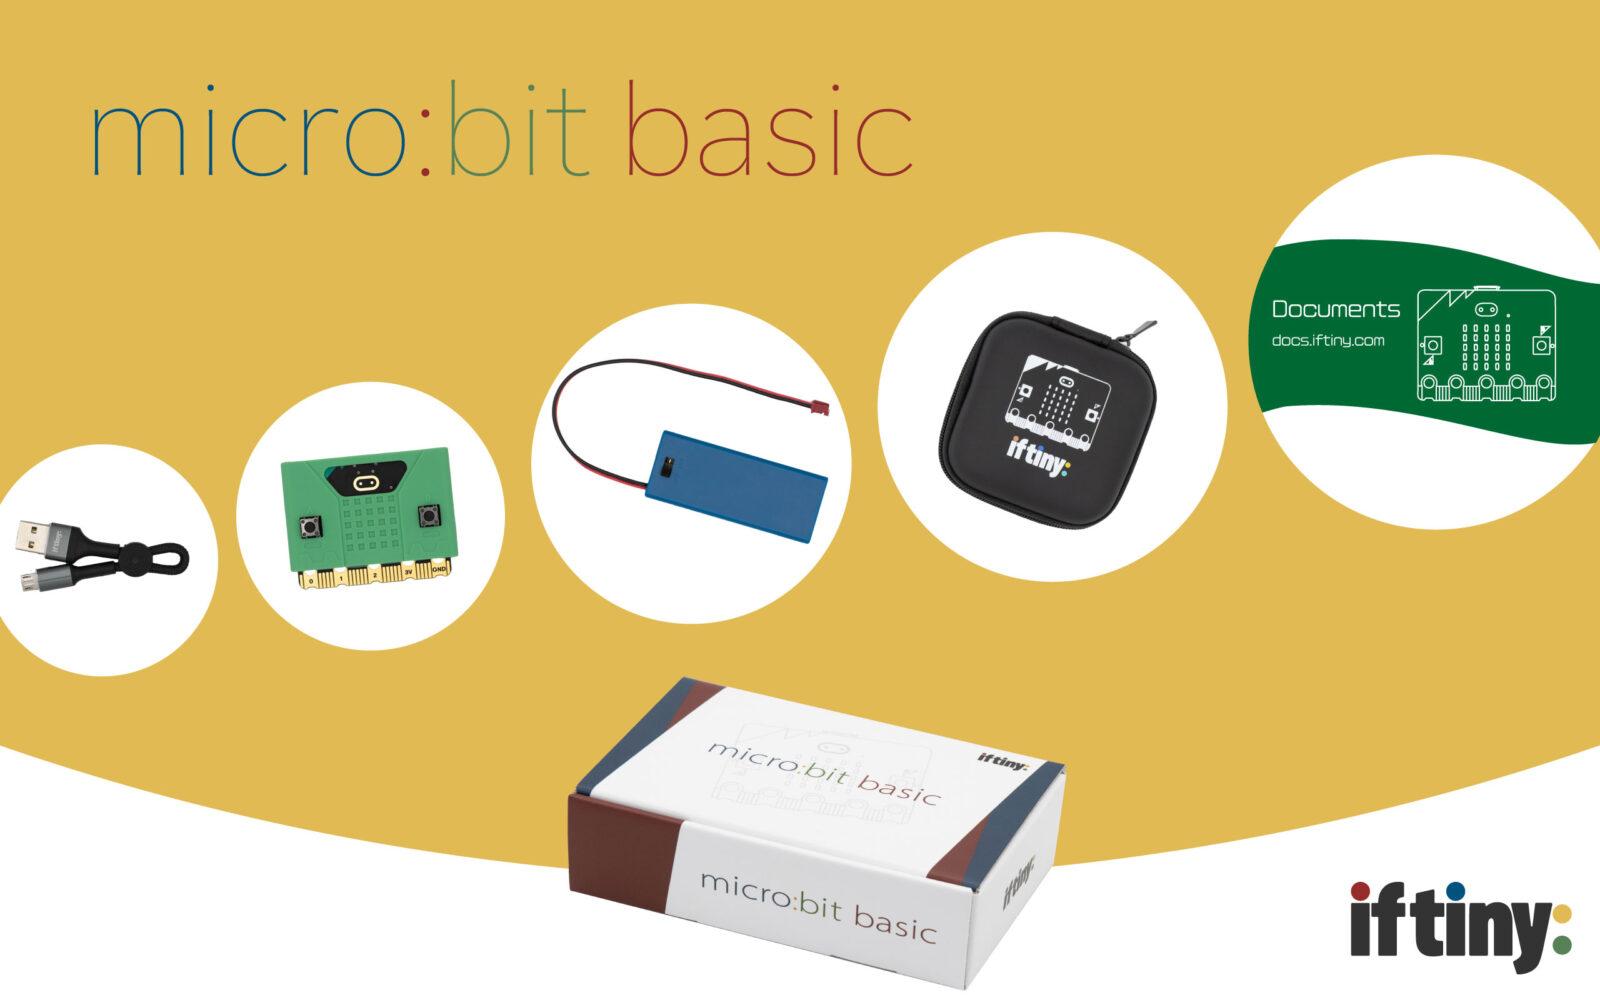 micro:bit basic